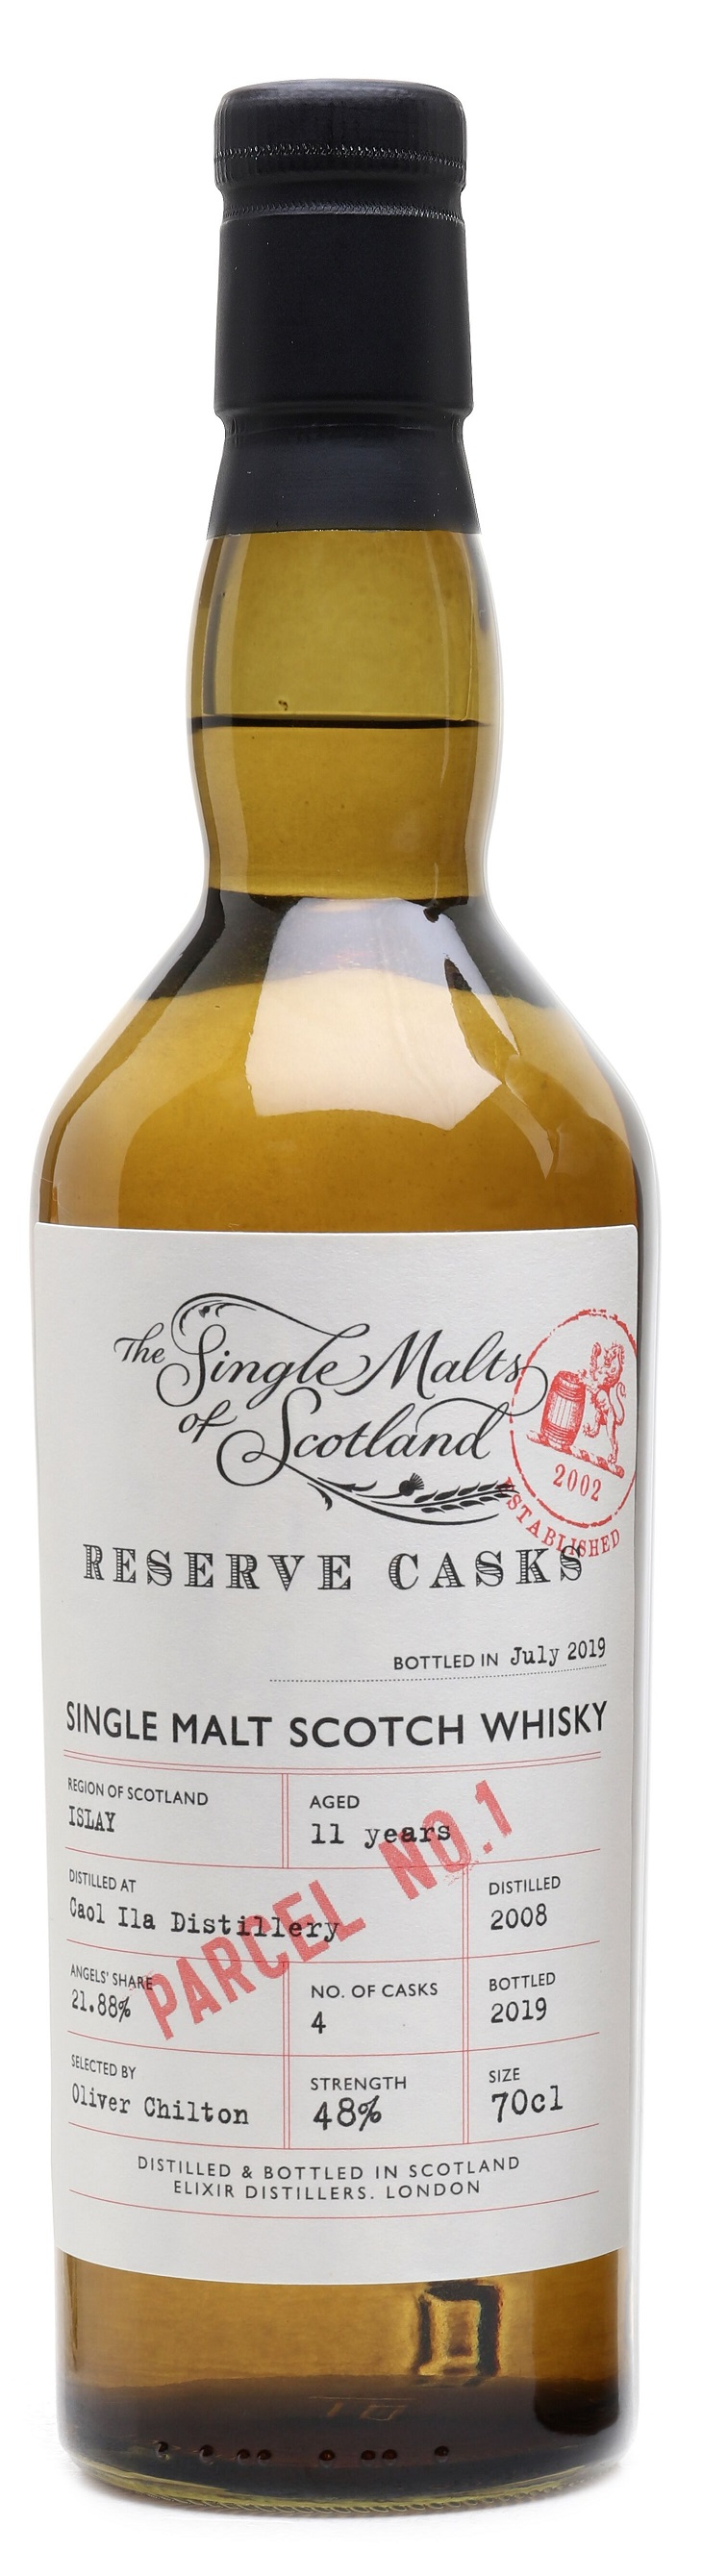 Caol Ila 11 yrs Single Malts of Scotland